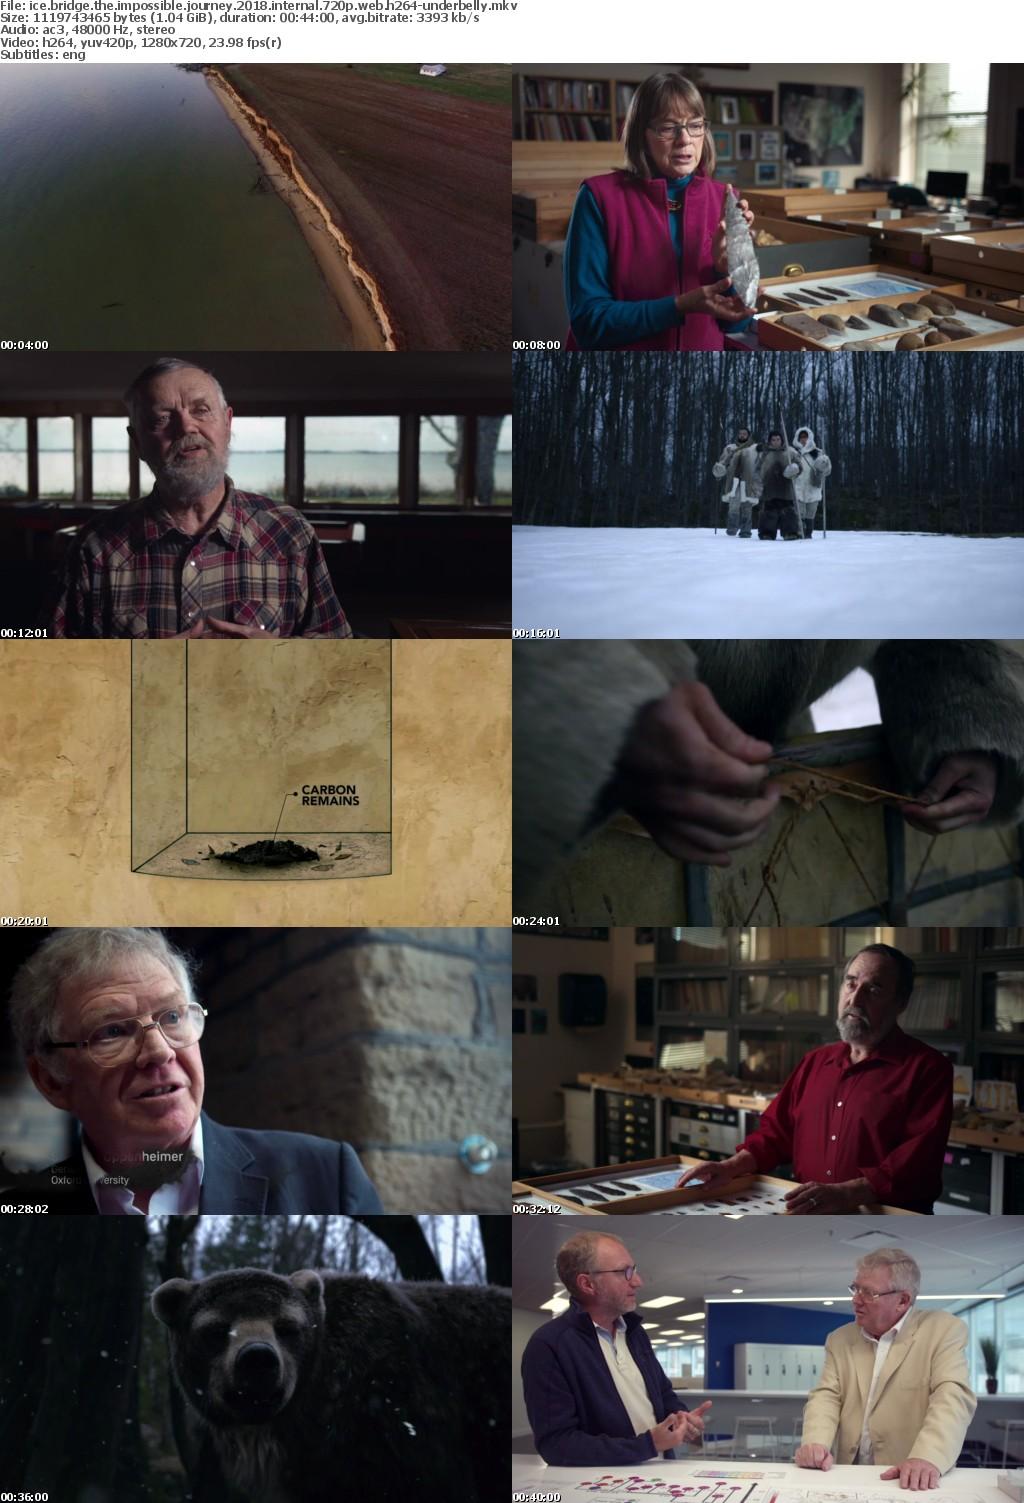 Ice Bridge The Impossible Journey 2018 INTERNAL 720p WEB H264-UNDERBELLY